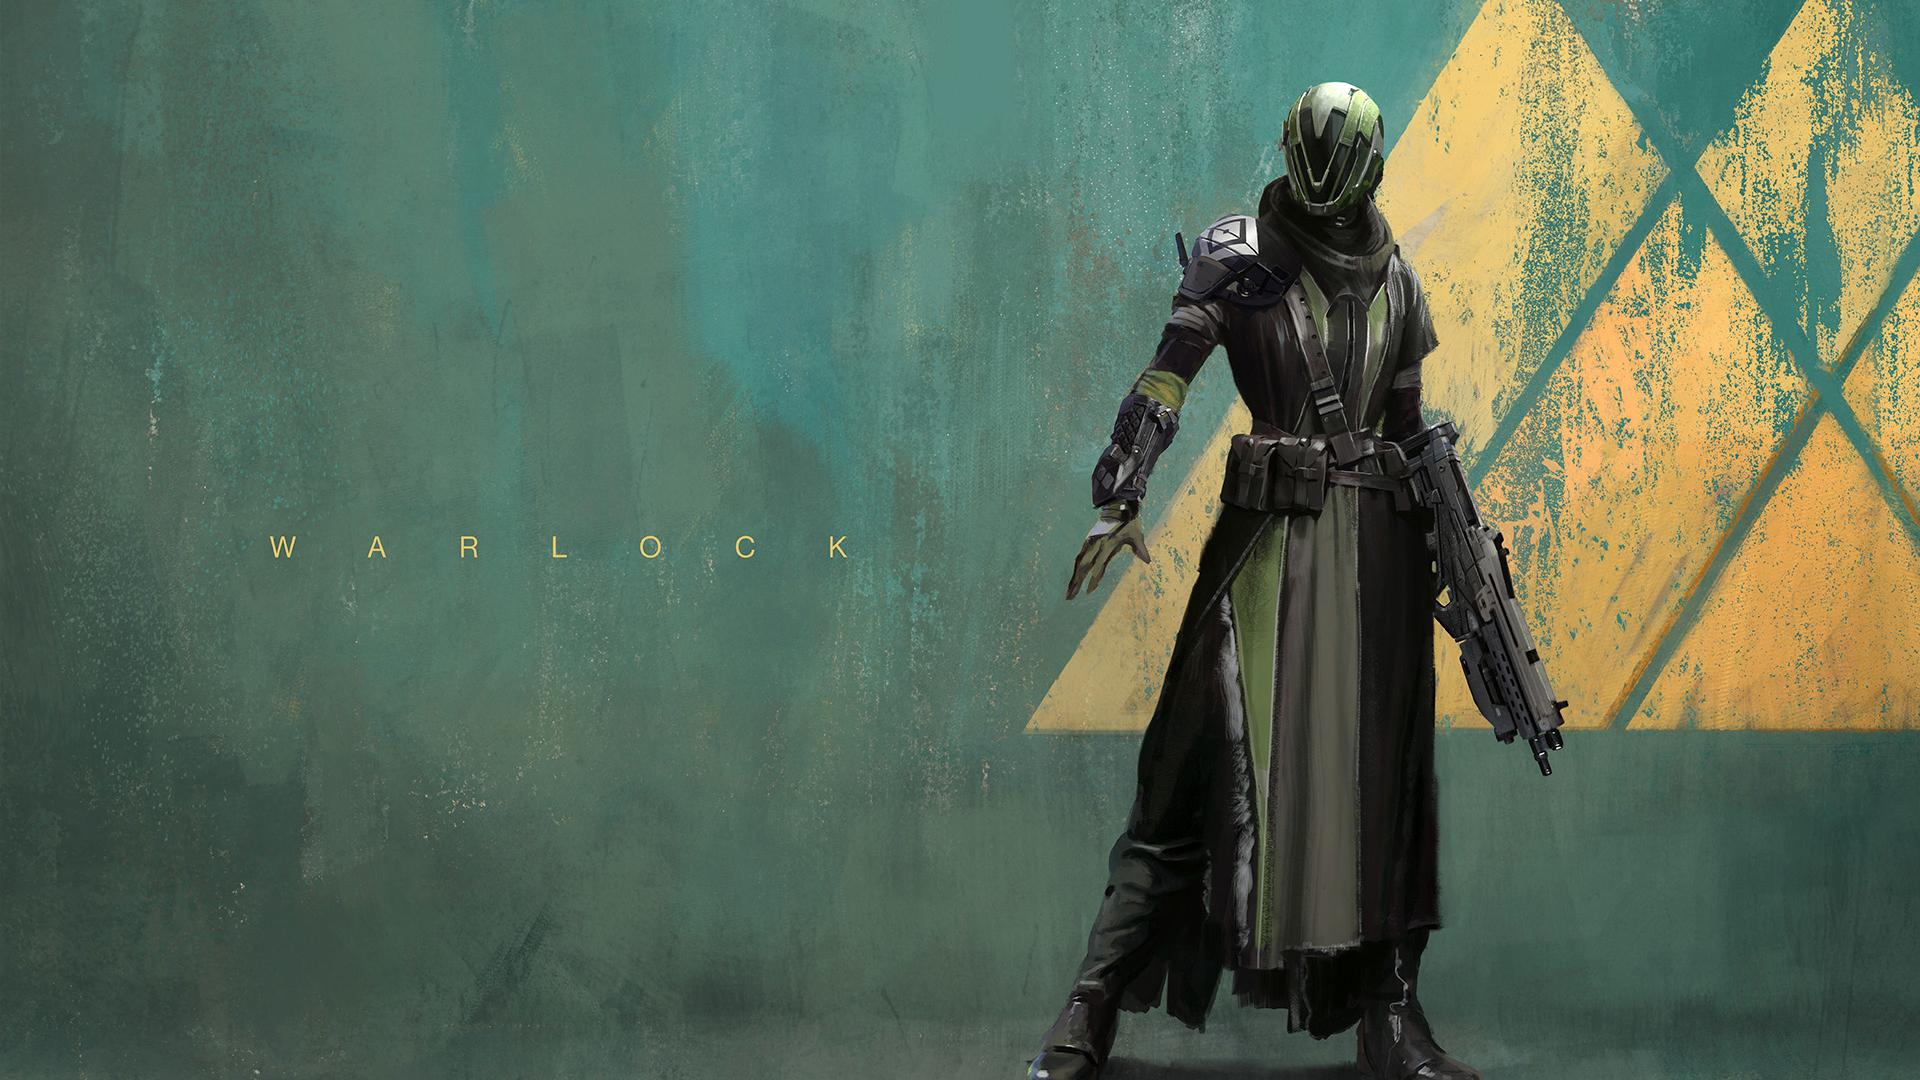 Warlock Destiny game Guardian class character HD 1920x1080 1080p and 1920x1080